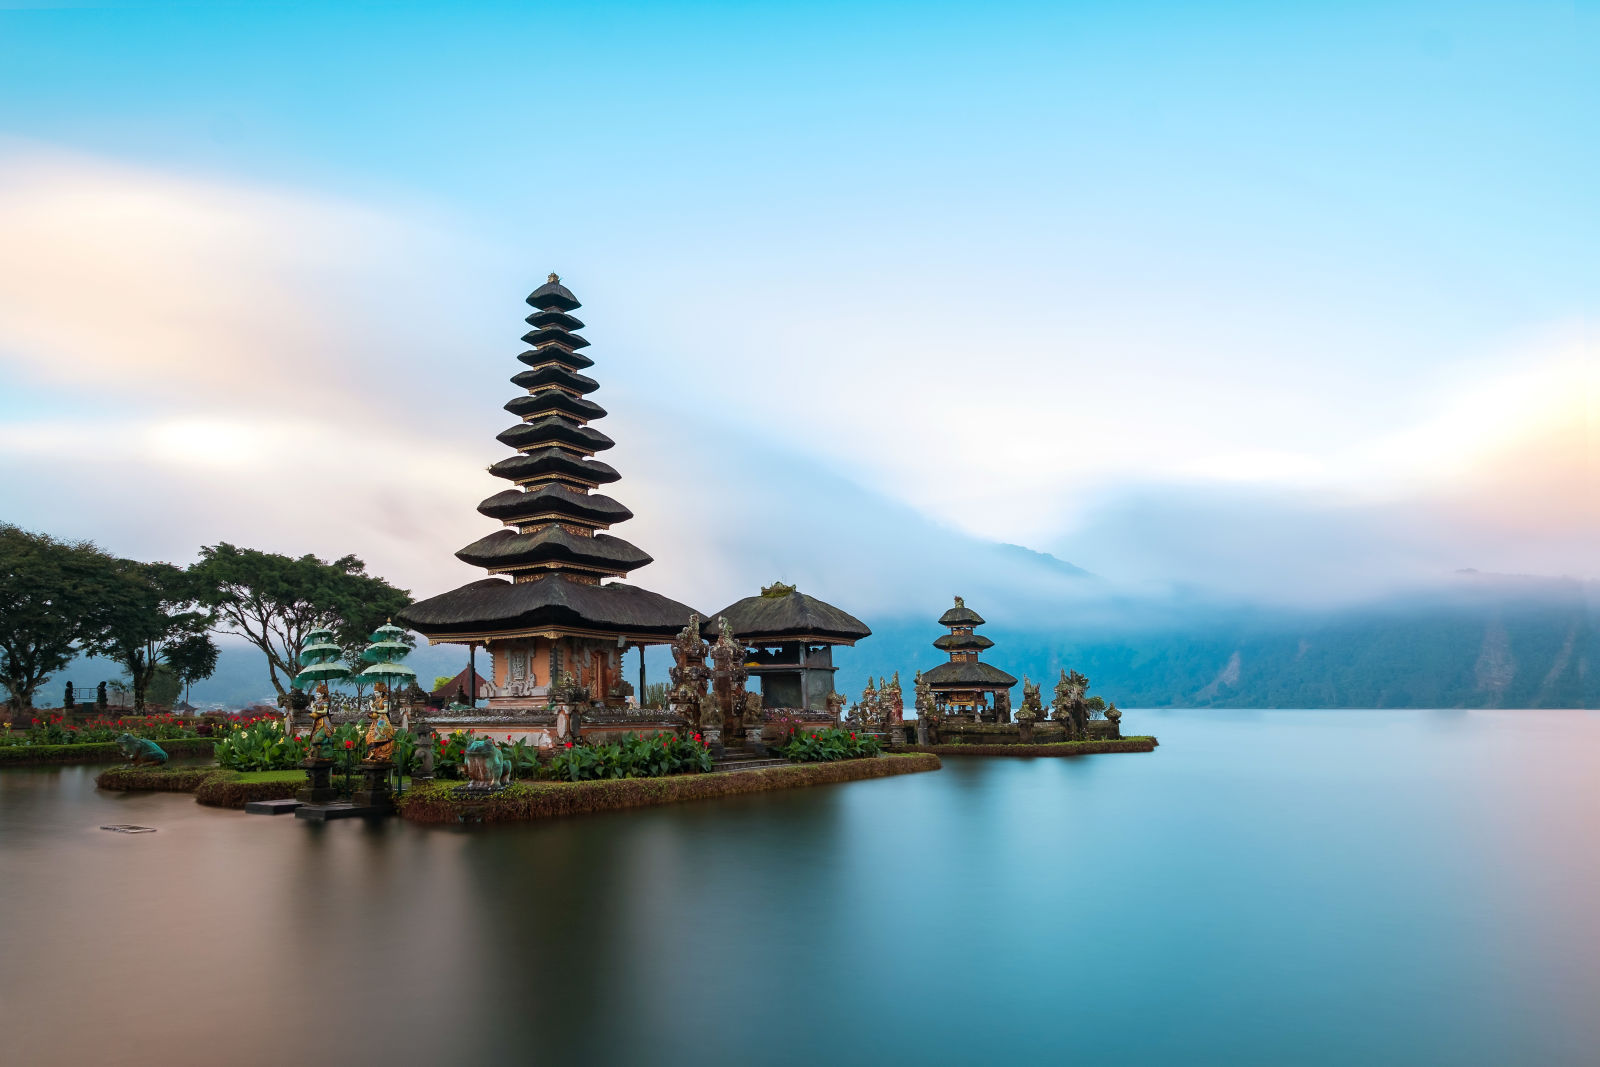 Asia, Bali, Denpasar